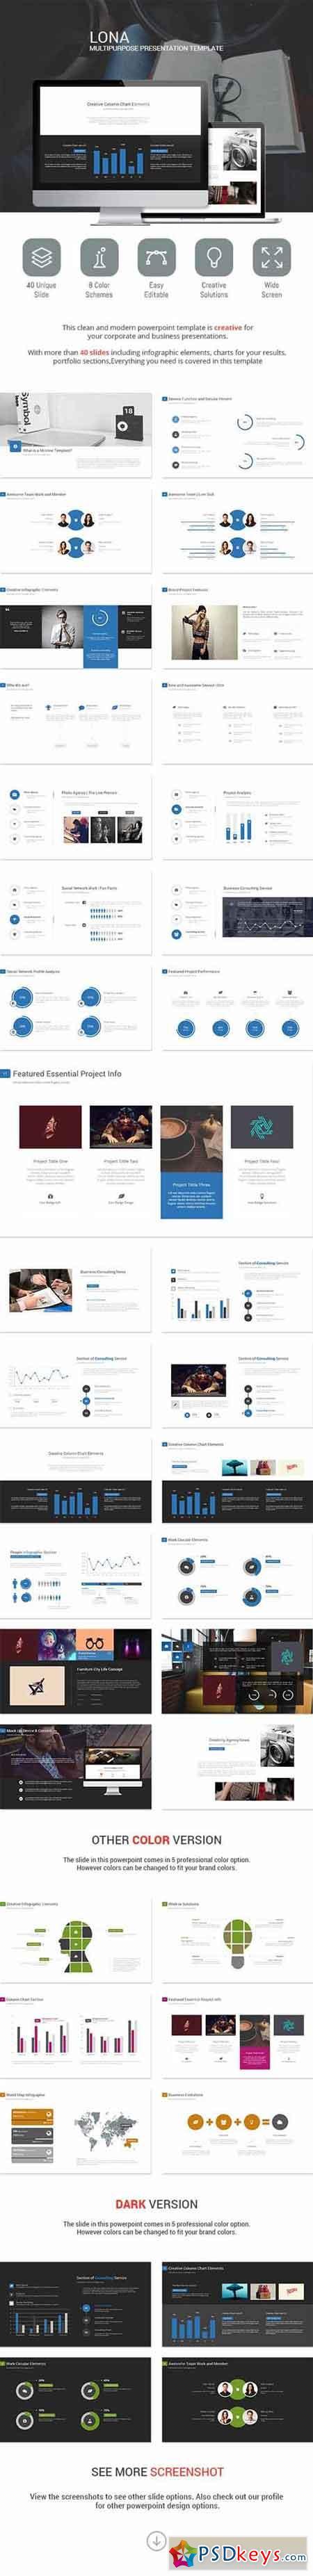 Lona Presentation Template 9729682